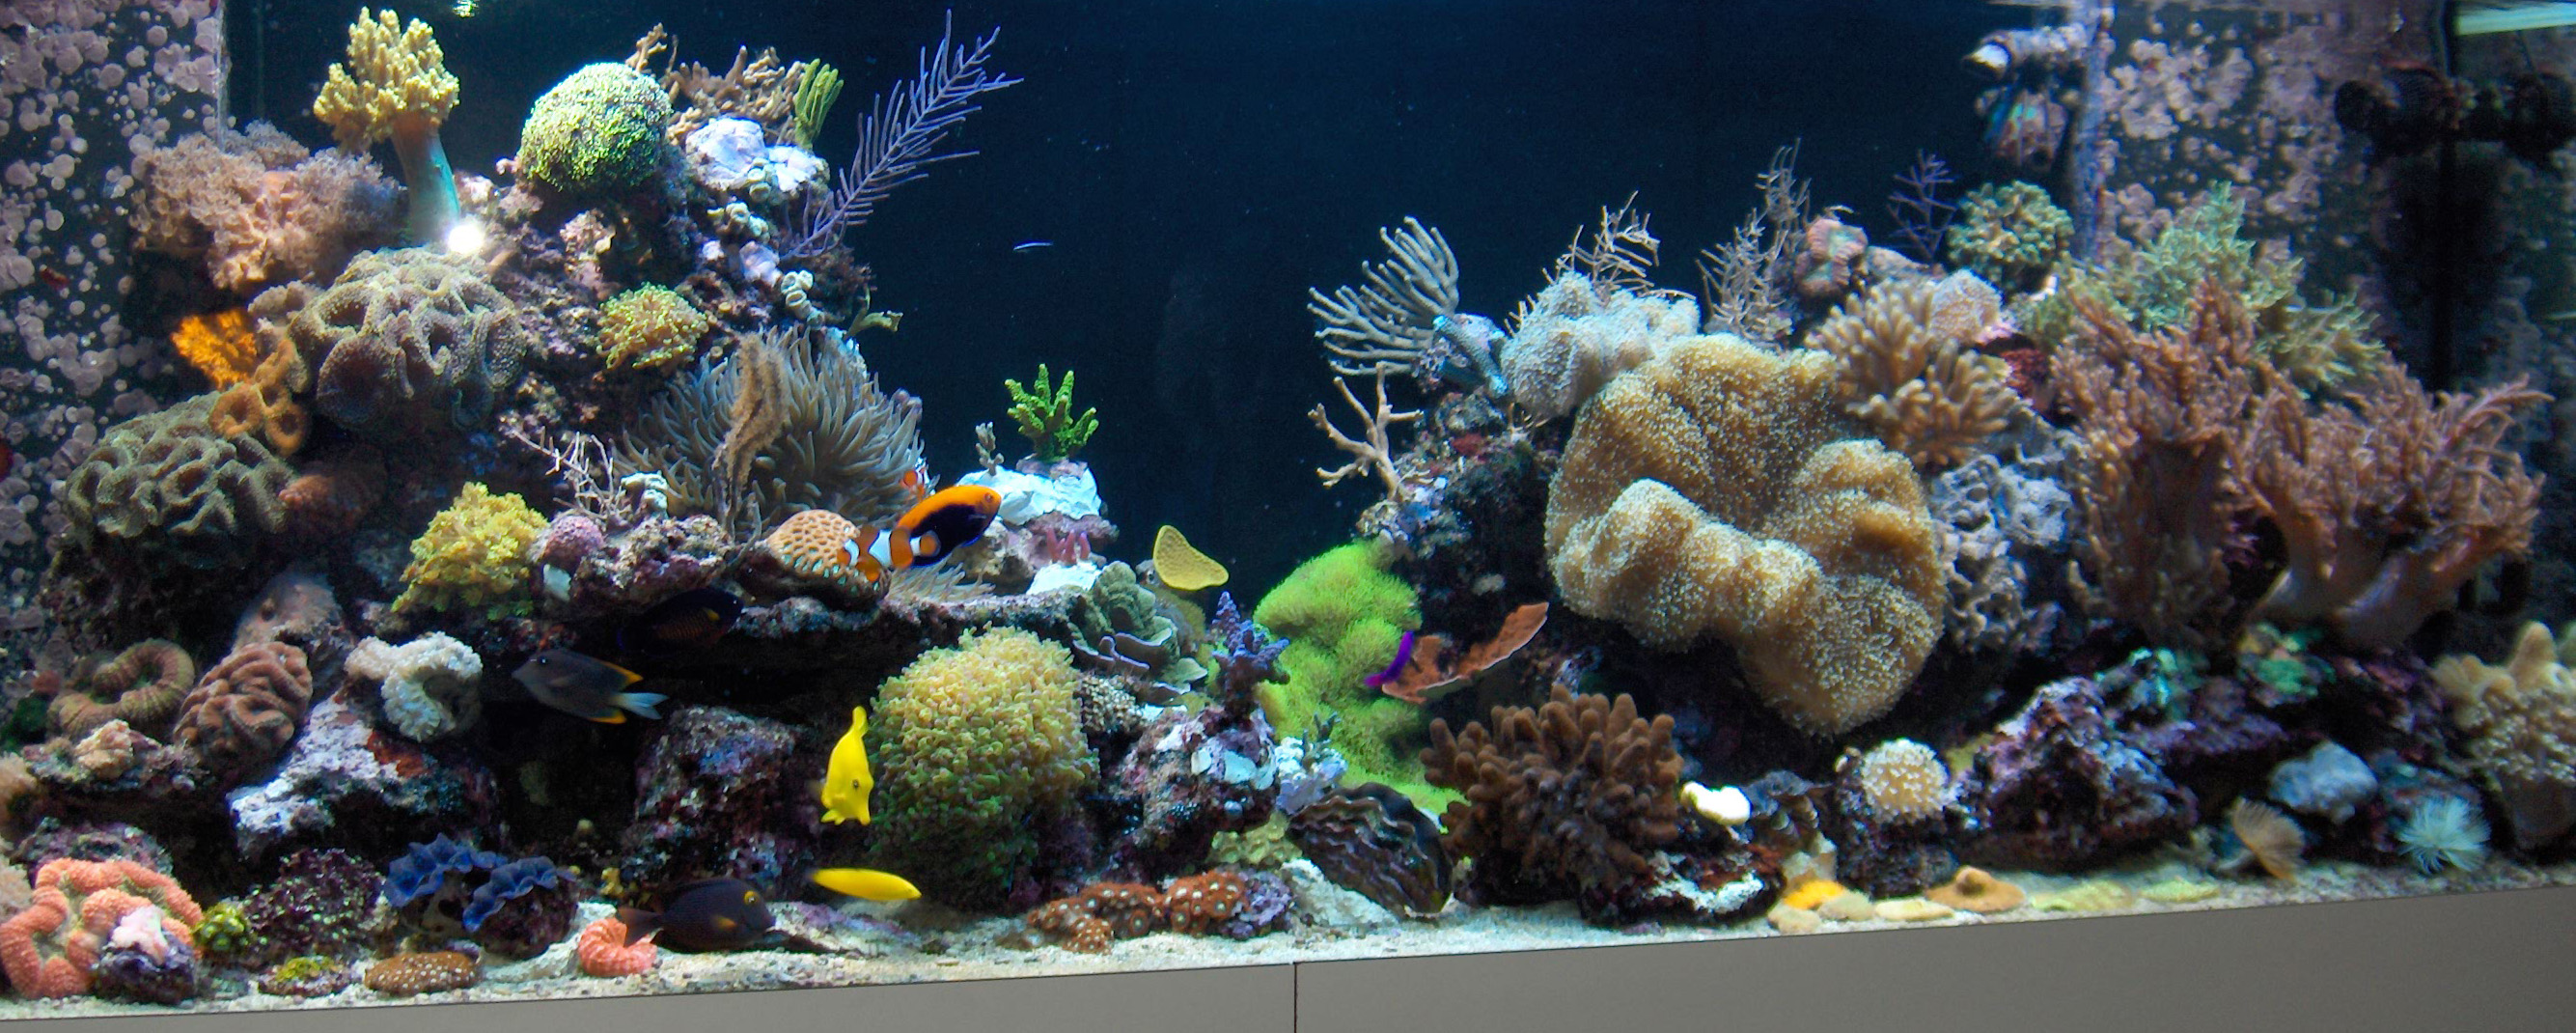 Zoetwater Aquarium Kopen  Atlantik compact 24 inch kubusrif aquarium u2022 orphek  Alles over de